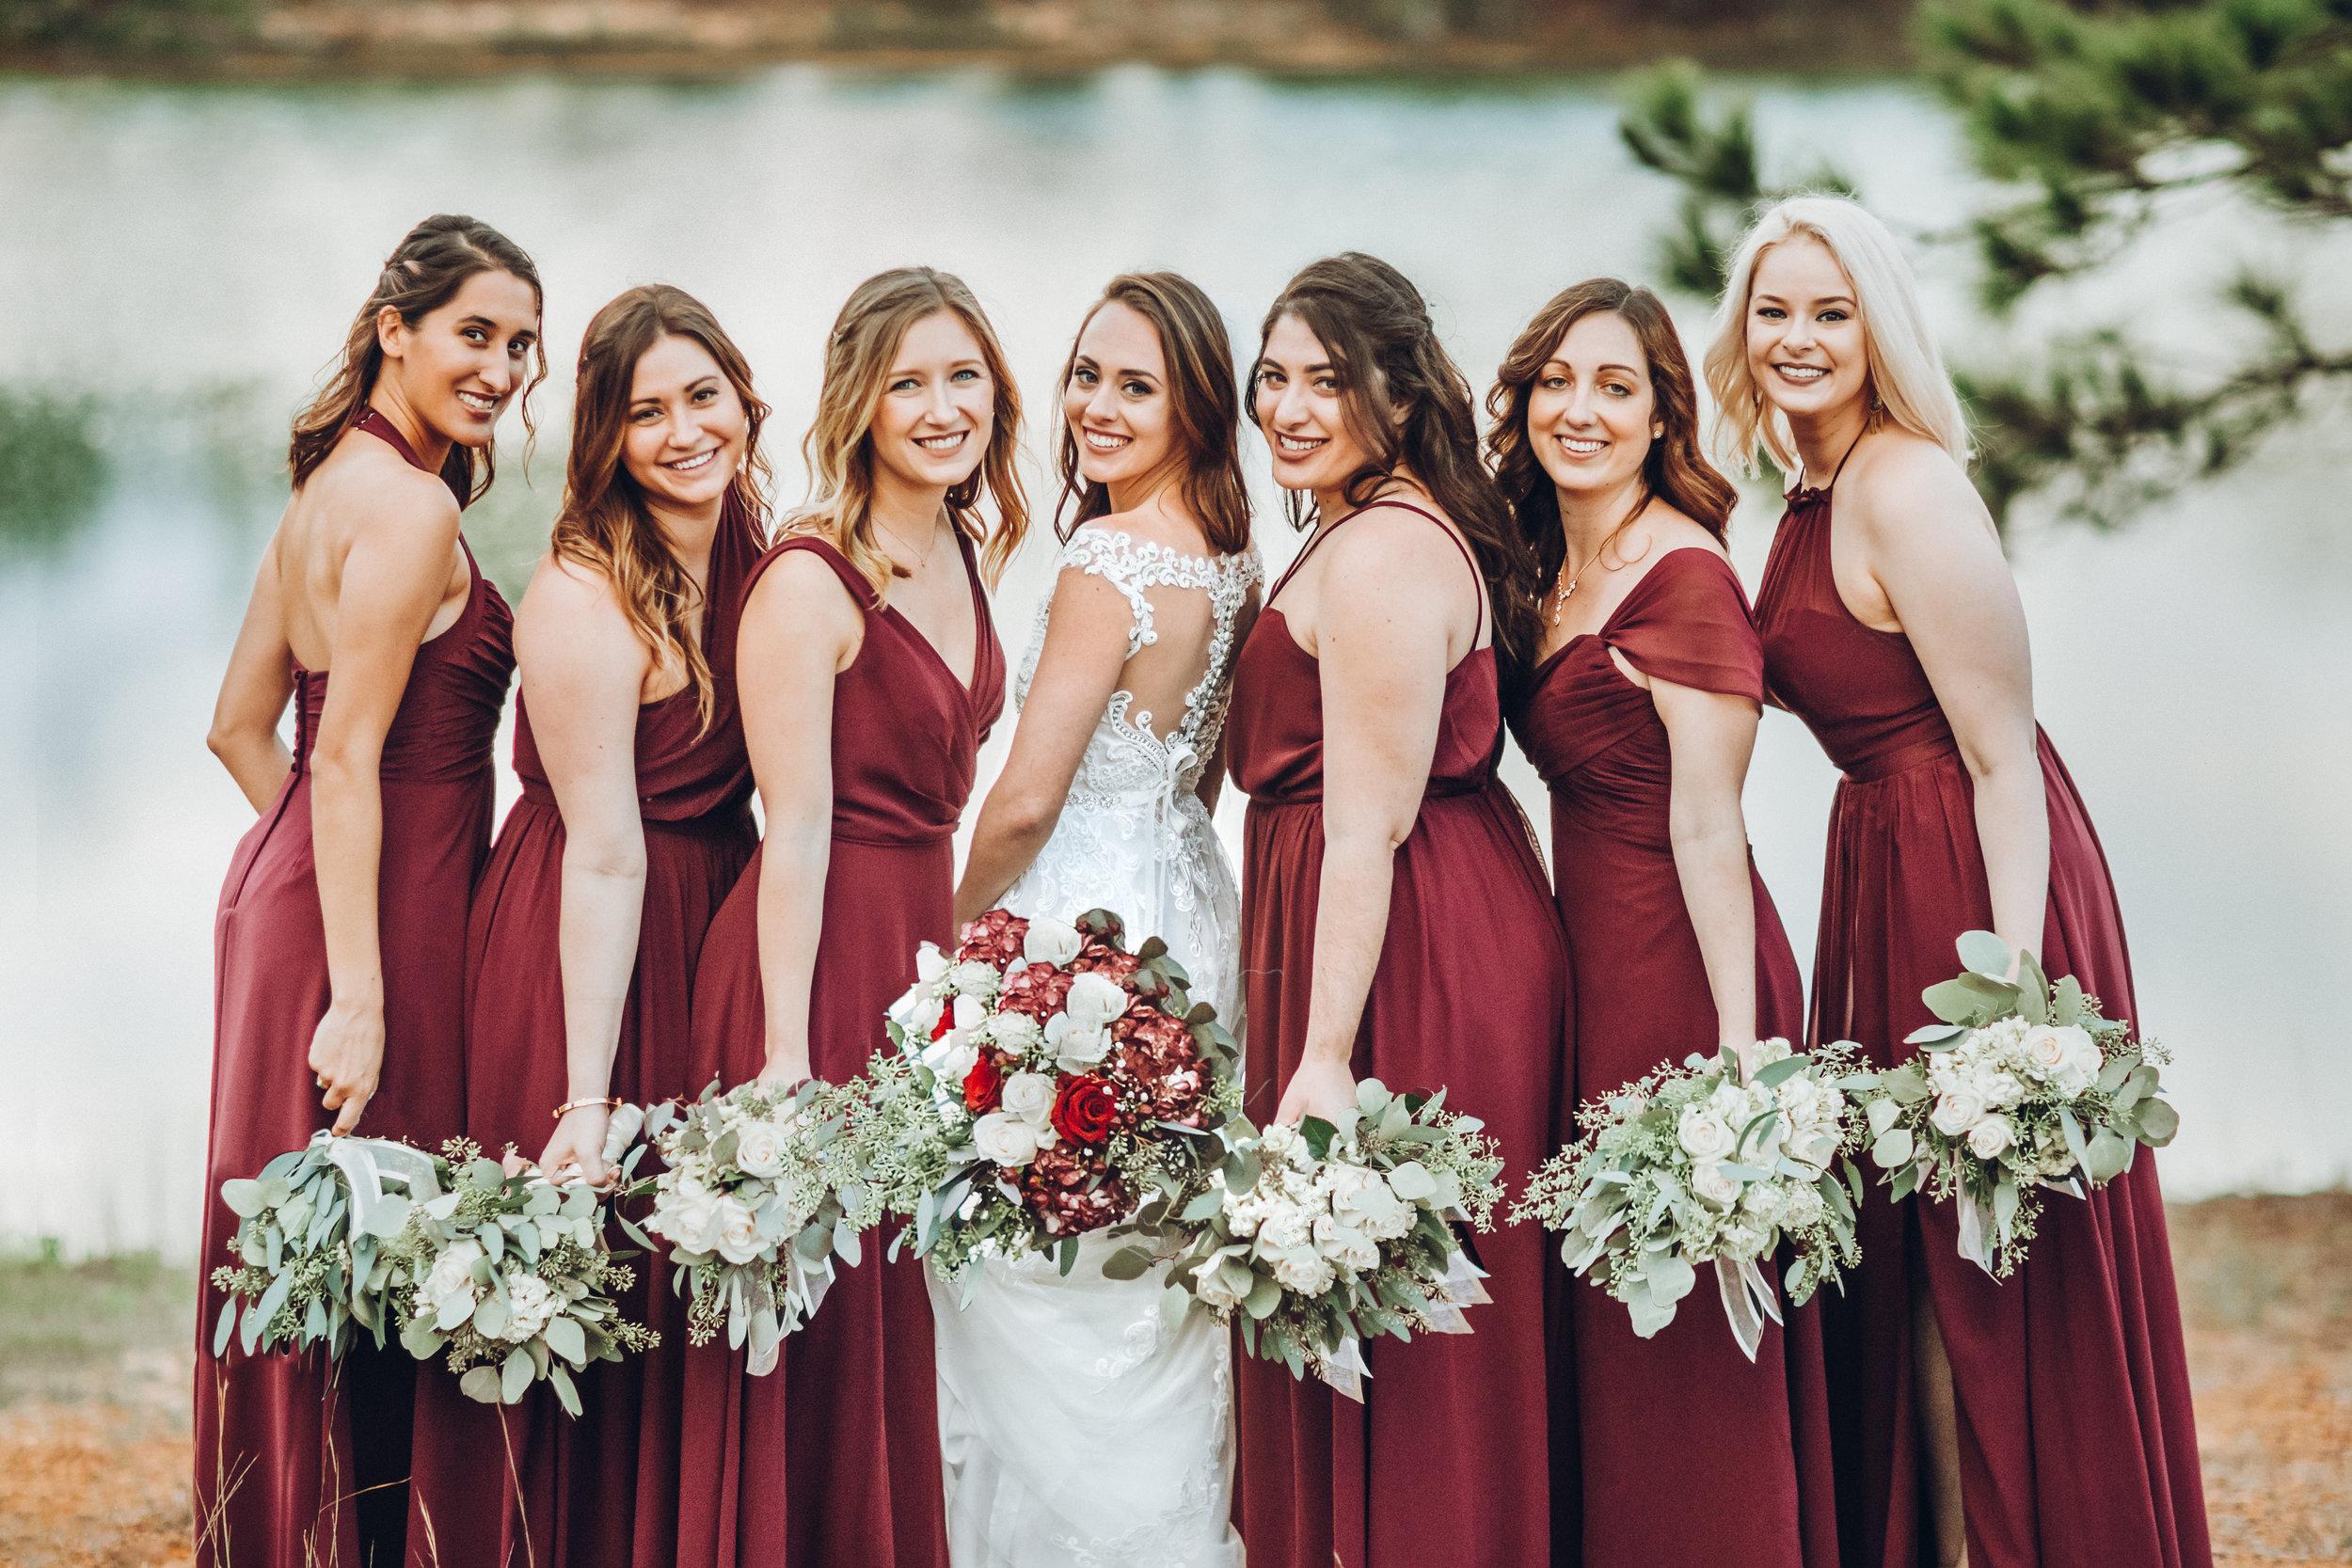 6. Bridal Party - Romantic Backyard Farm Wedding - Lauren+Daniel 031.jpg